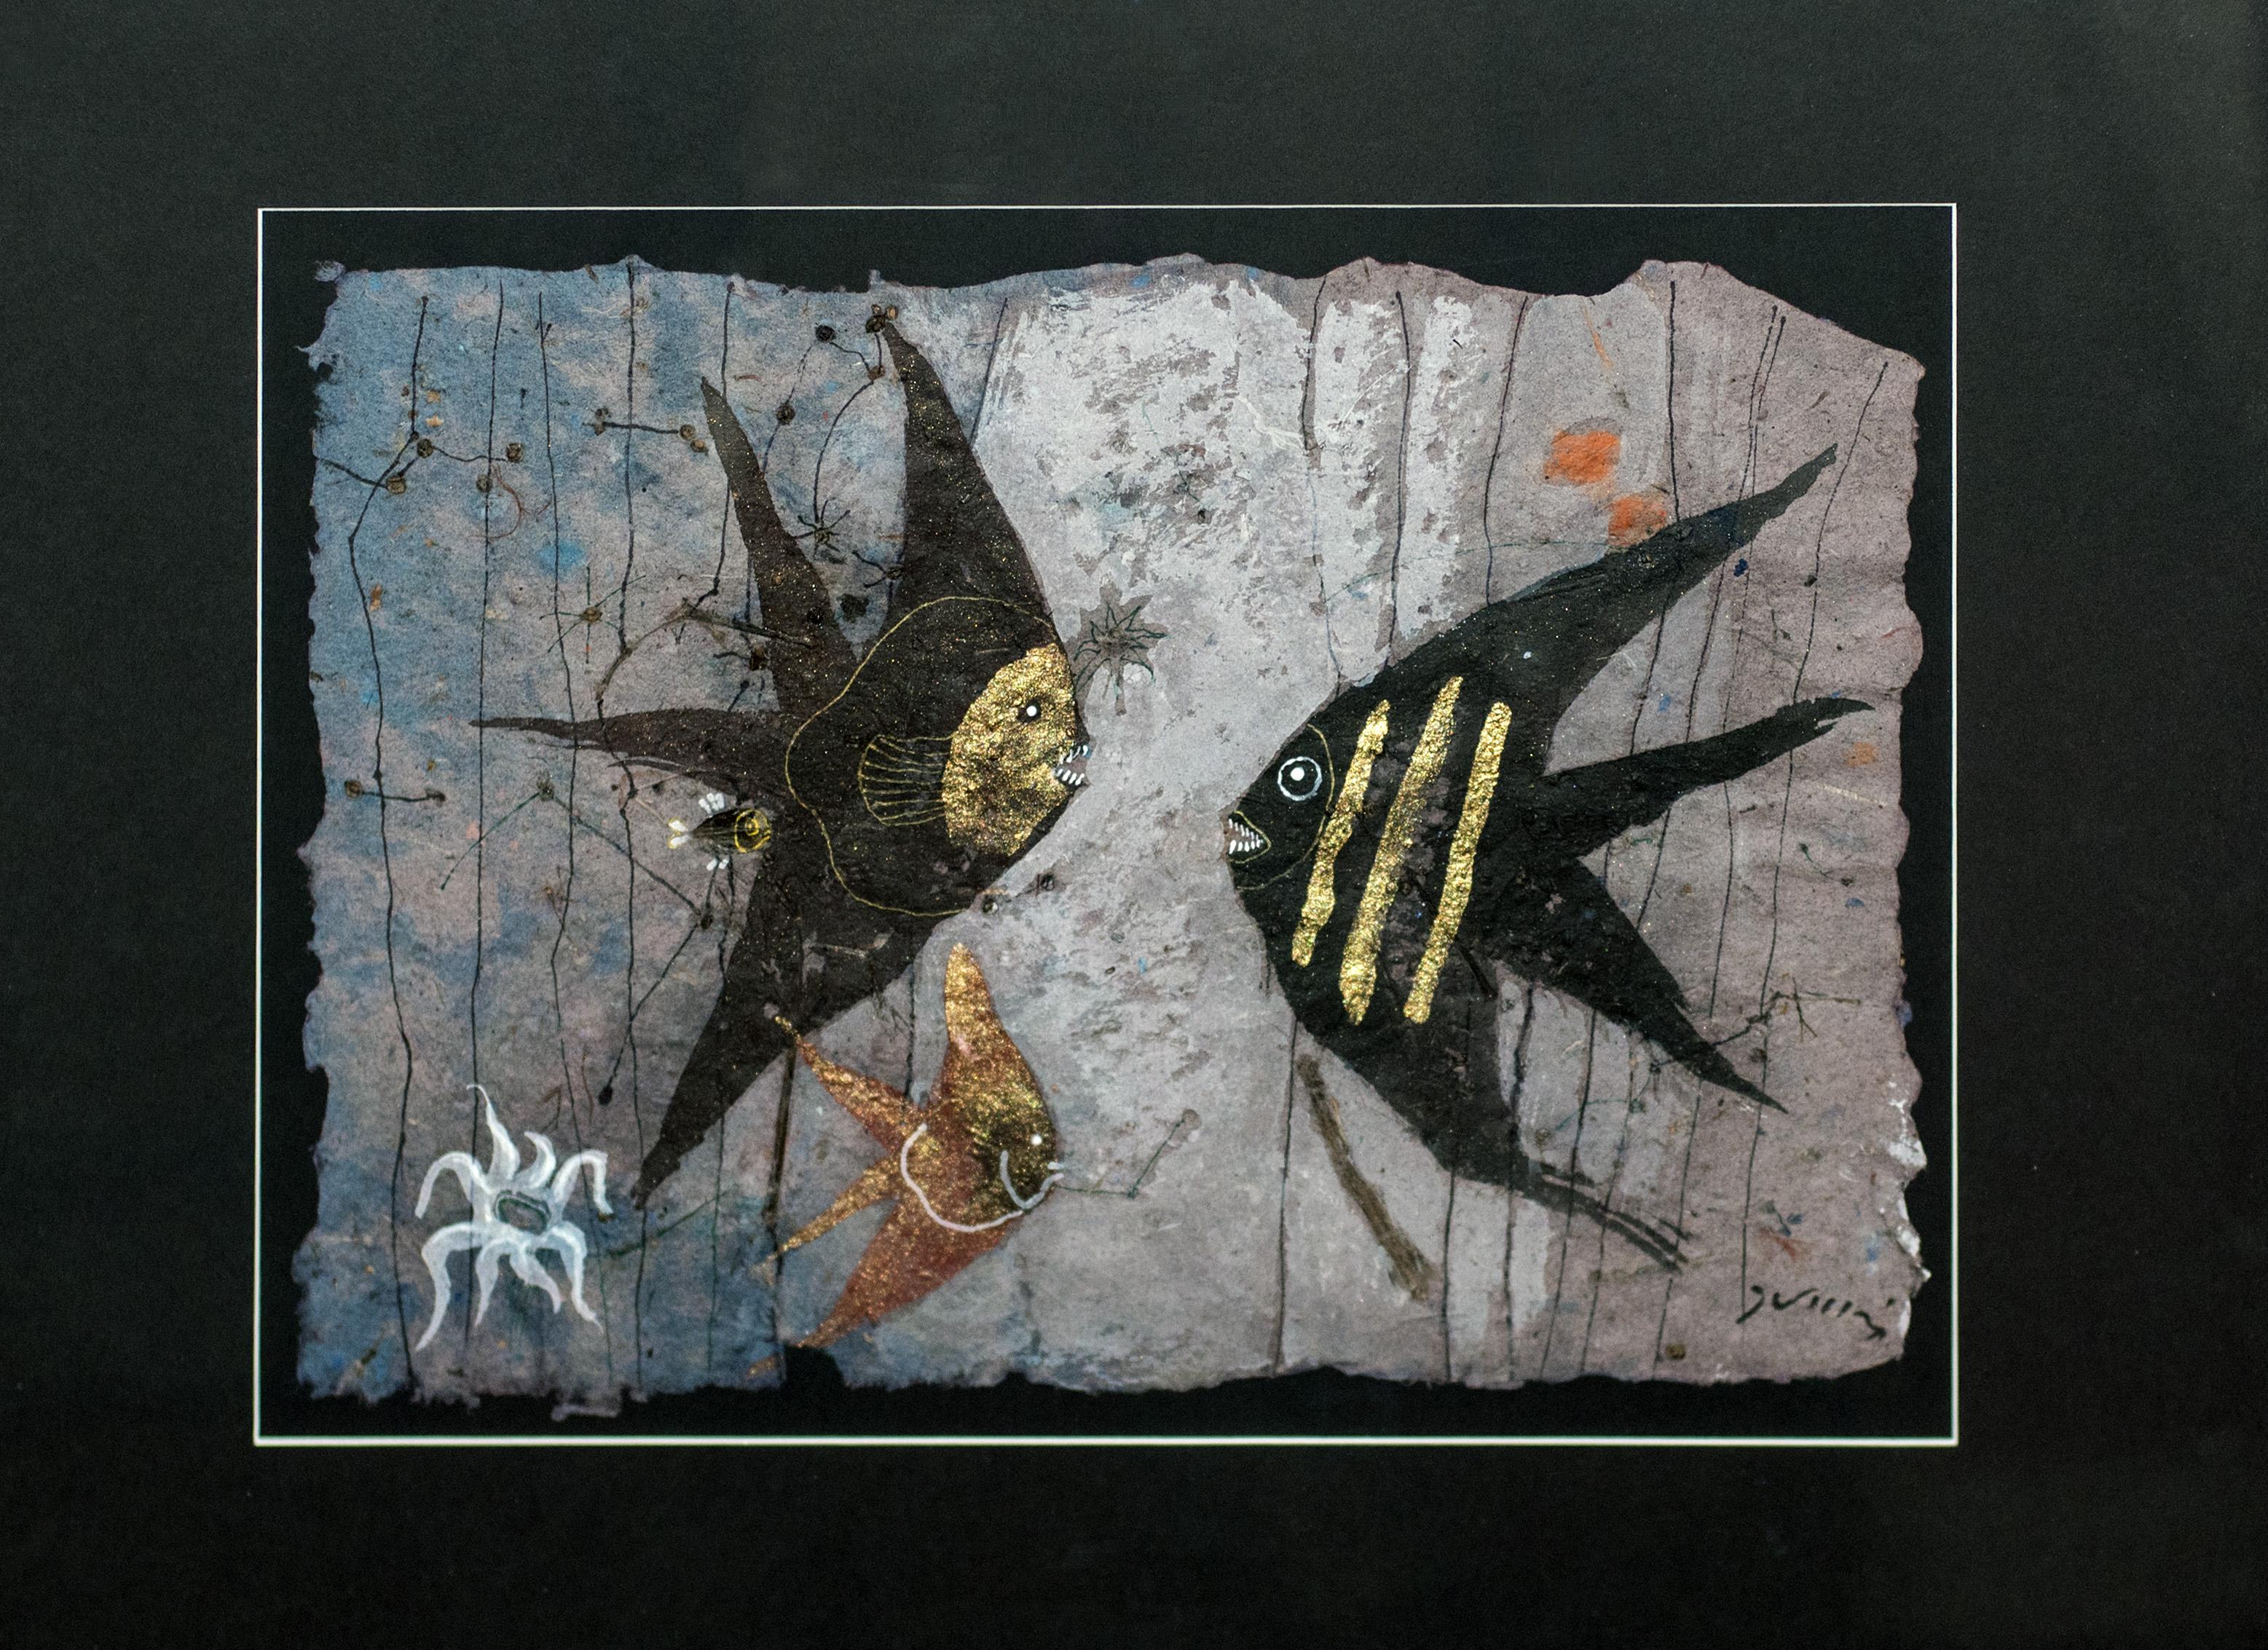 """Ryby-czarne skalary"", 2018"